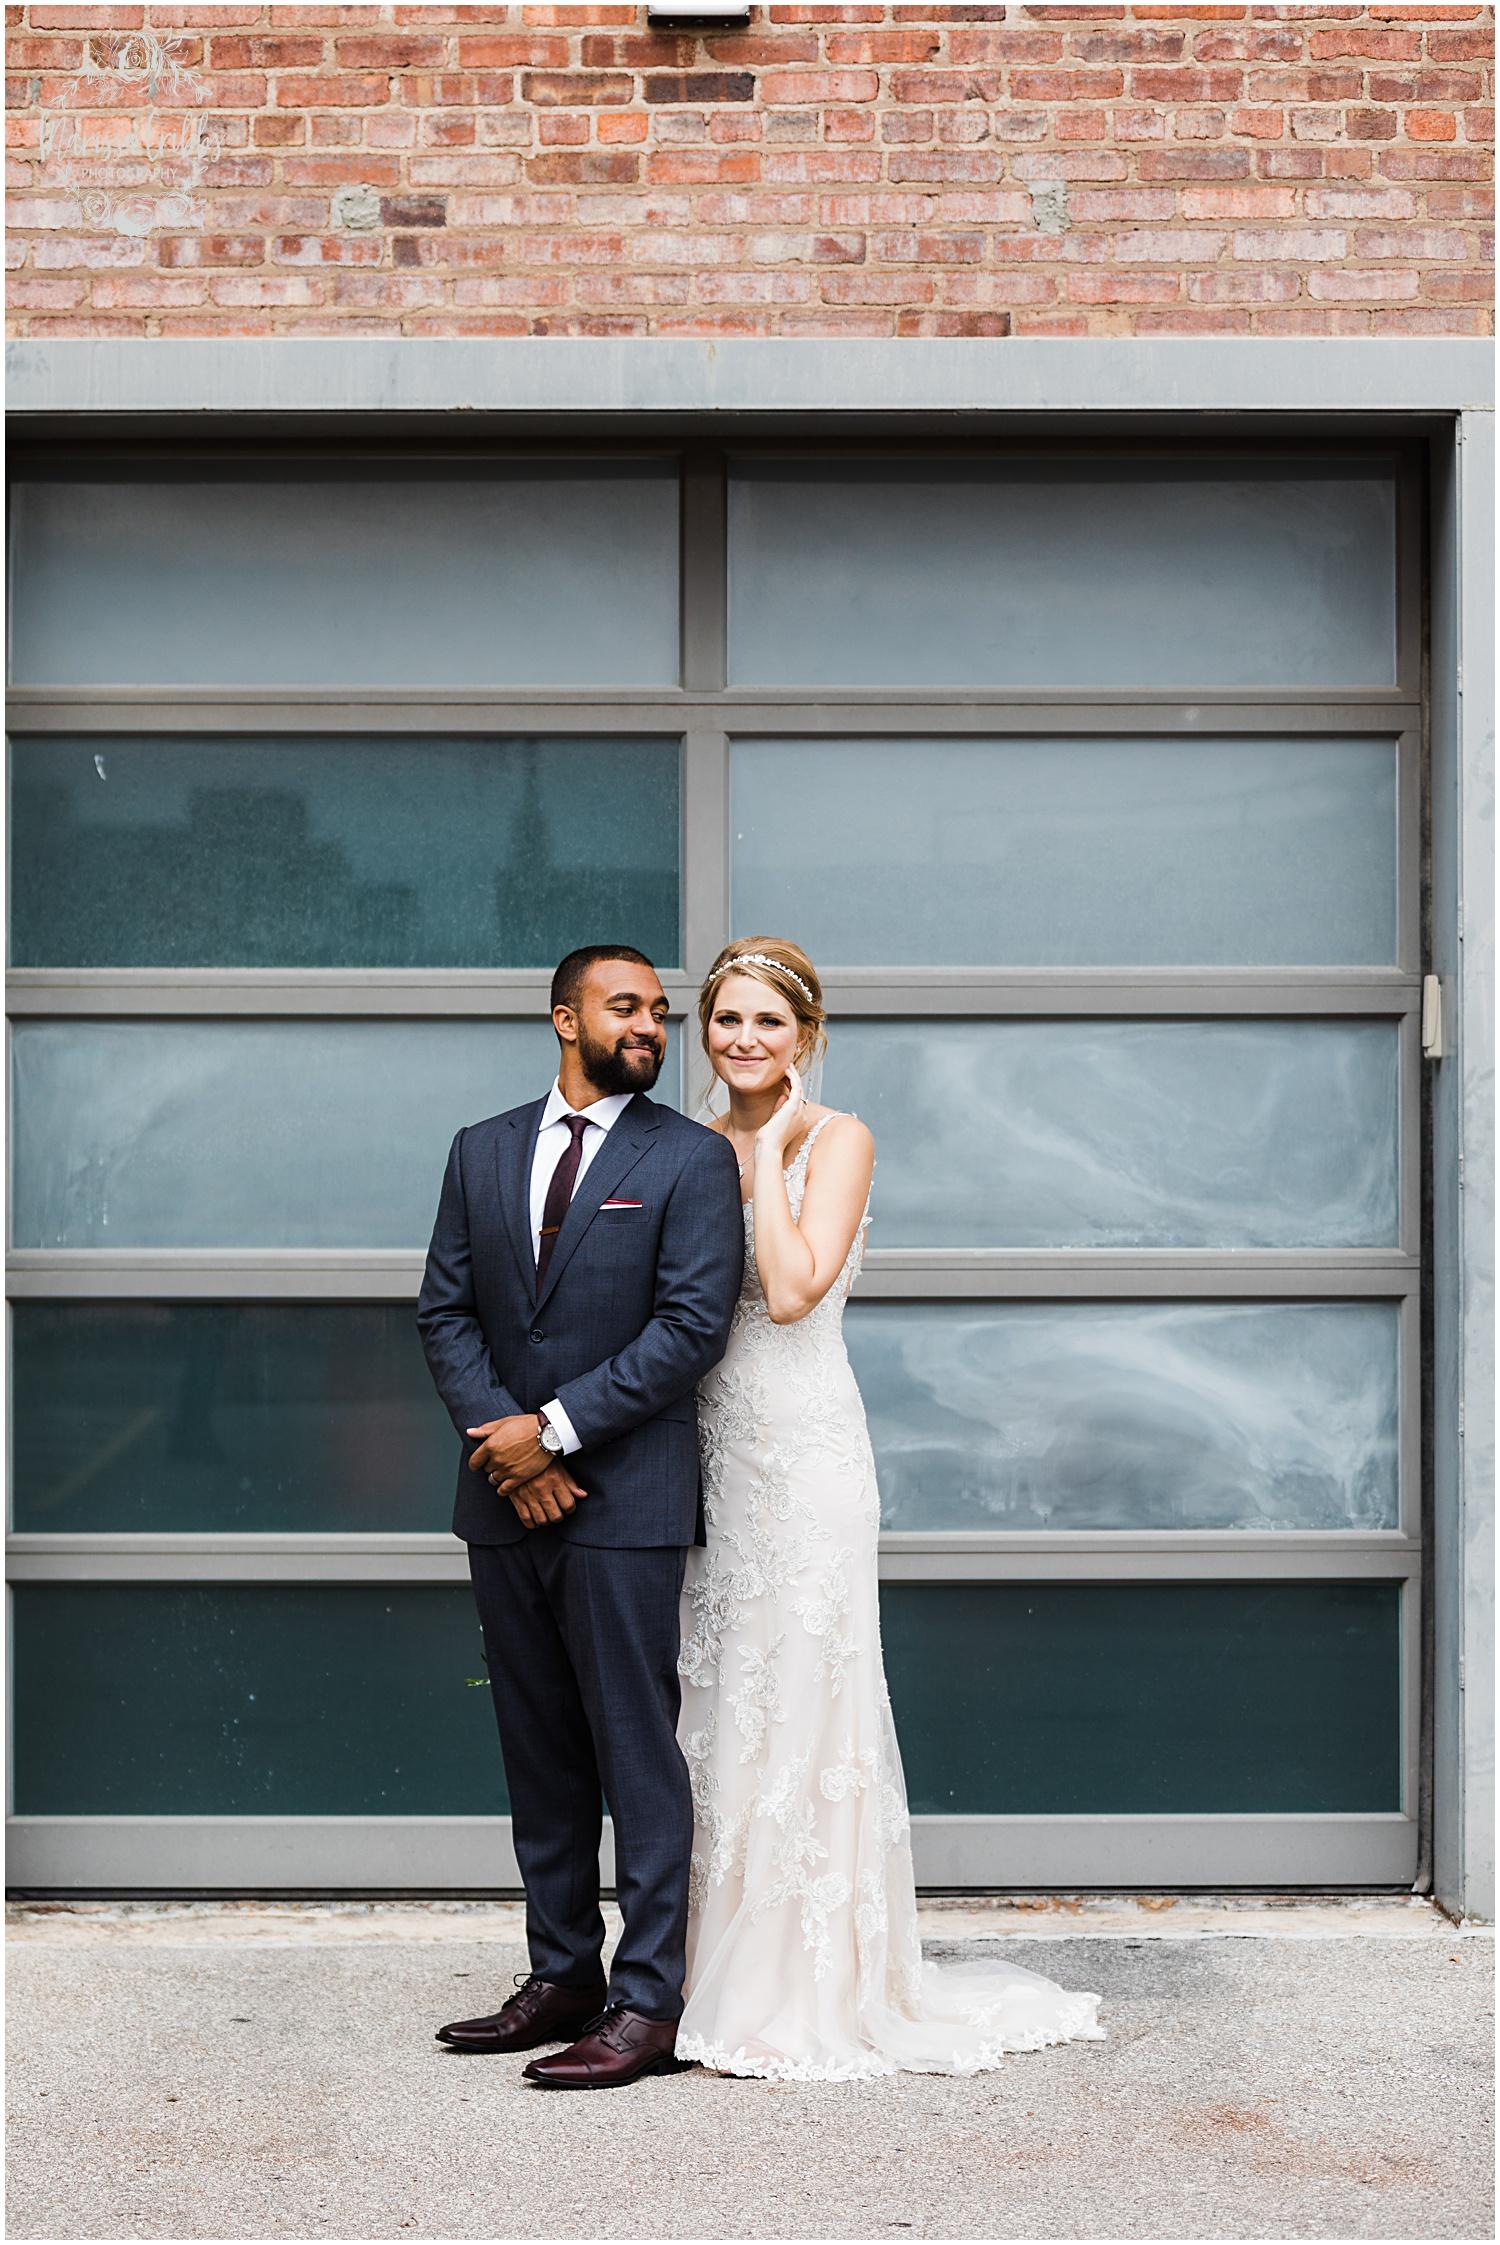 BAUER WEDDING   KELSEA & JUSTIN   MARISSA CRIBBS PHOTOGRAPHY_6534.jpg